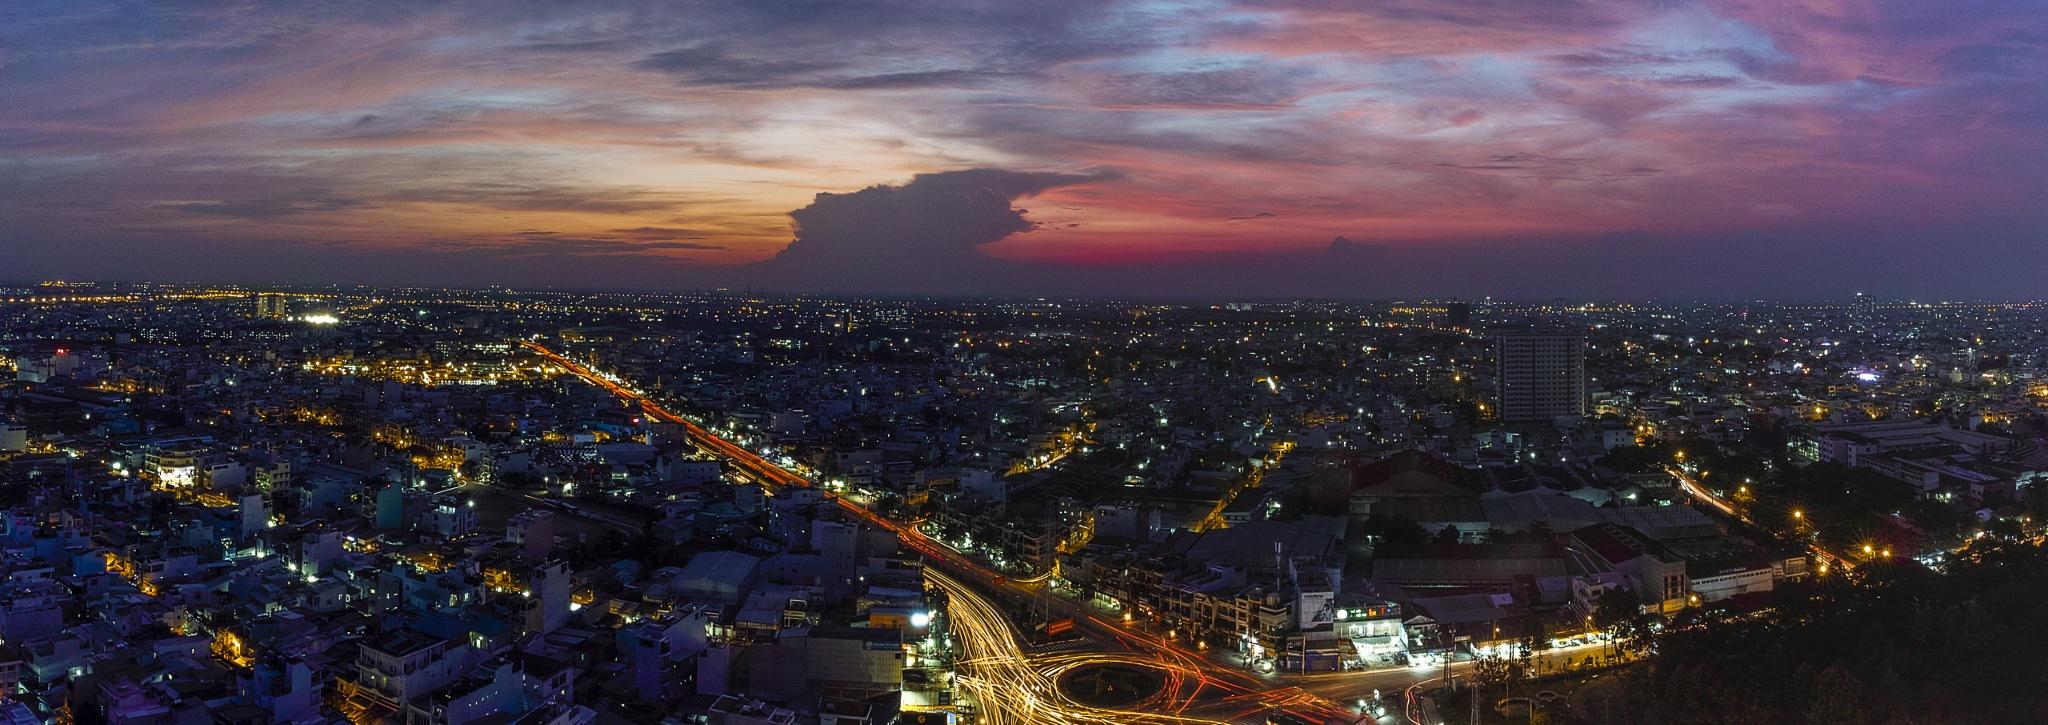 Sunset in Saigon by Hải Sơn